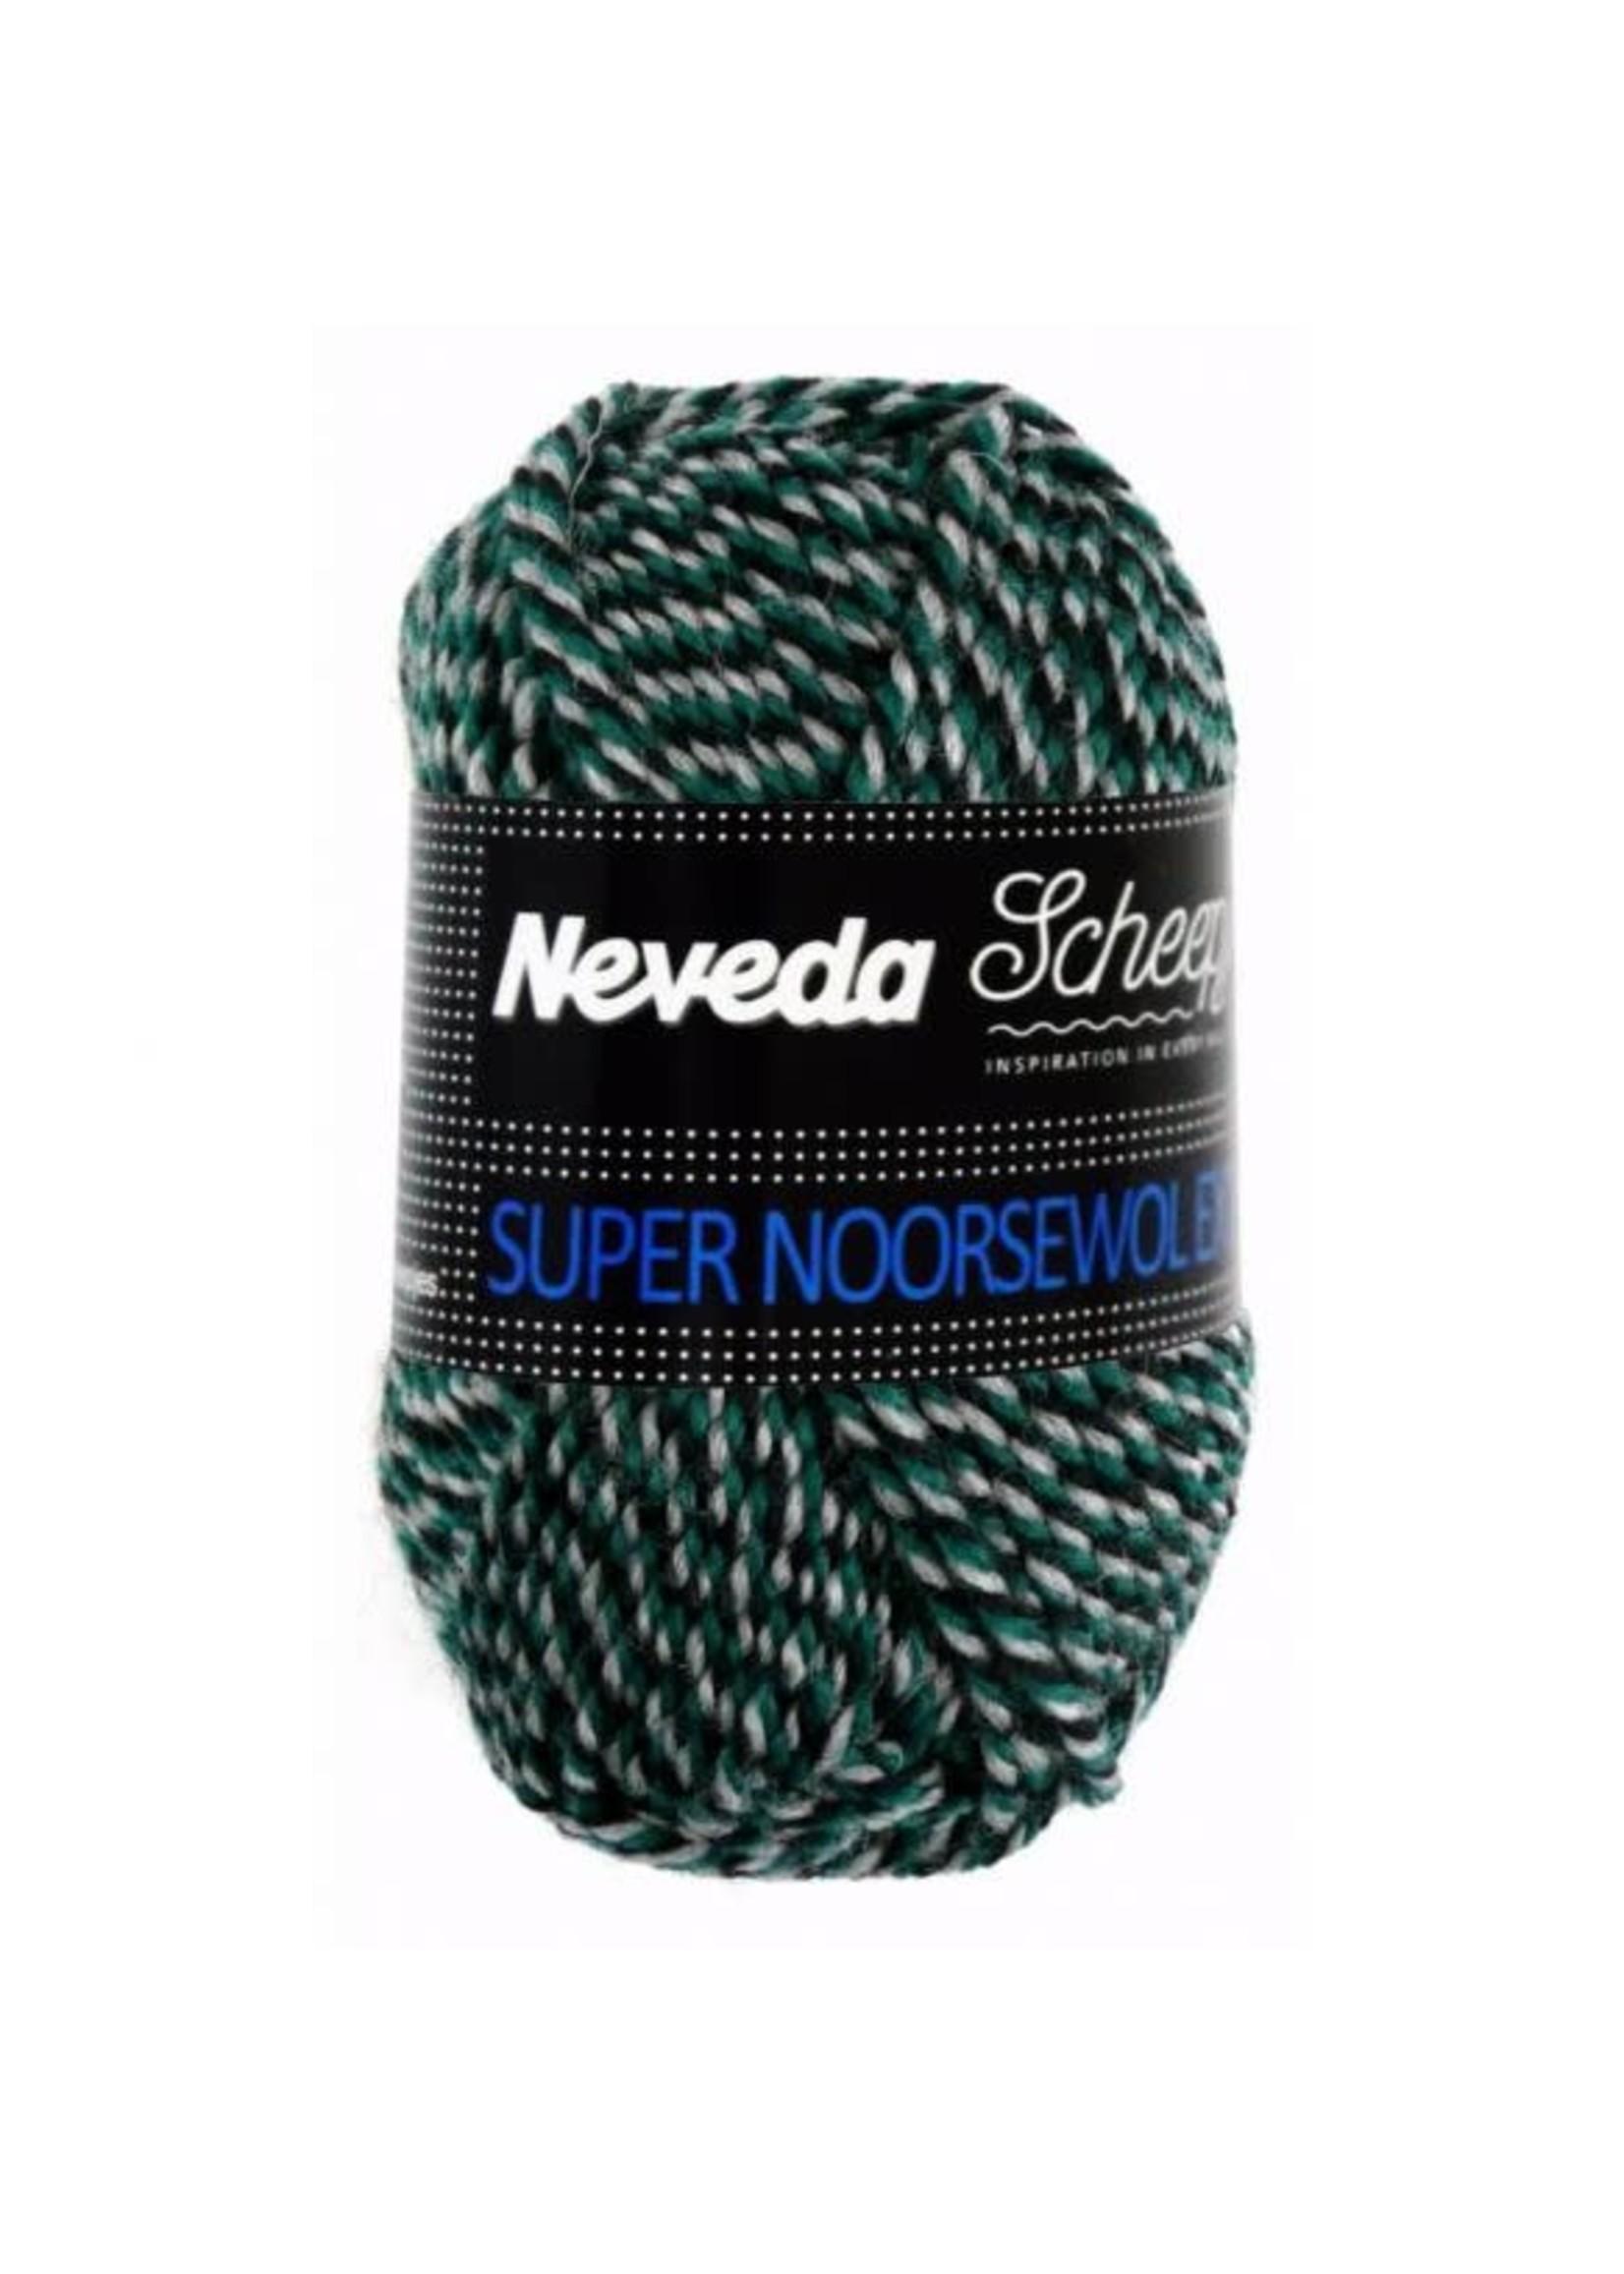 Scheepjes Super Noorse Extra 50gr - 1706 Zwart, groen, grijs